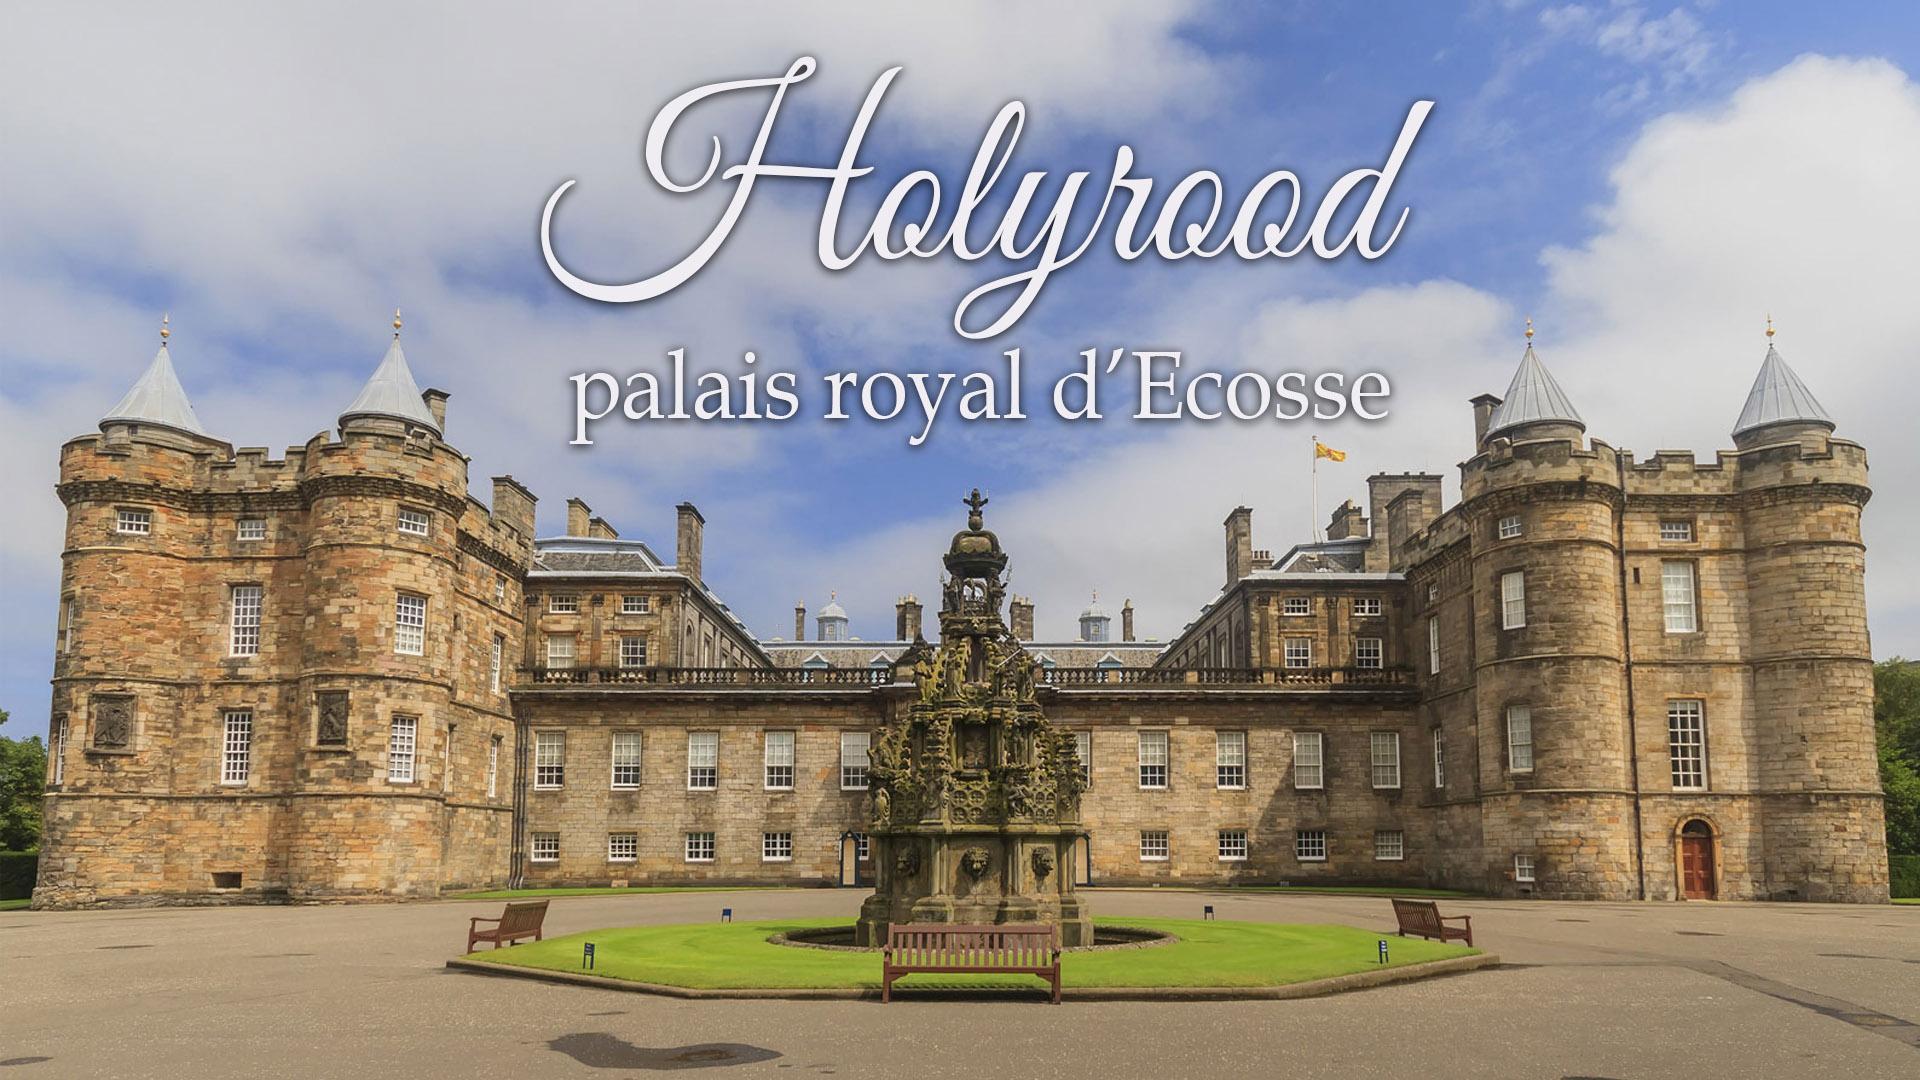 Holyrood affichage